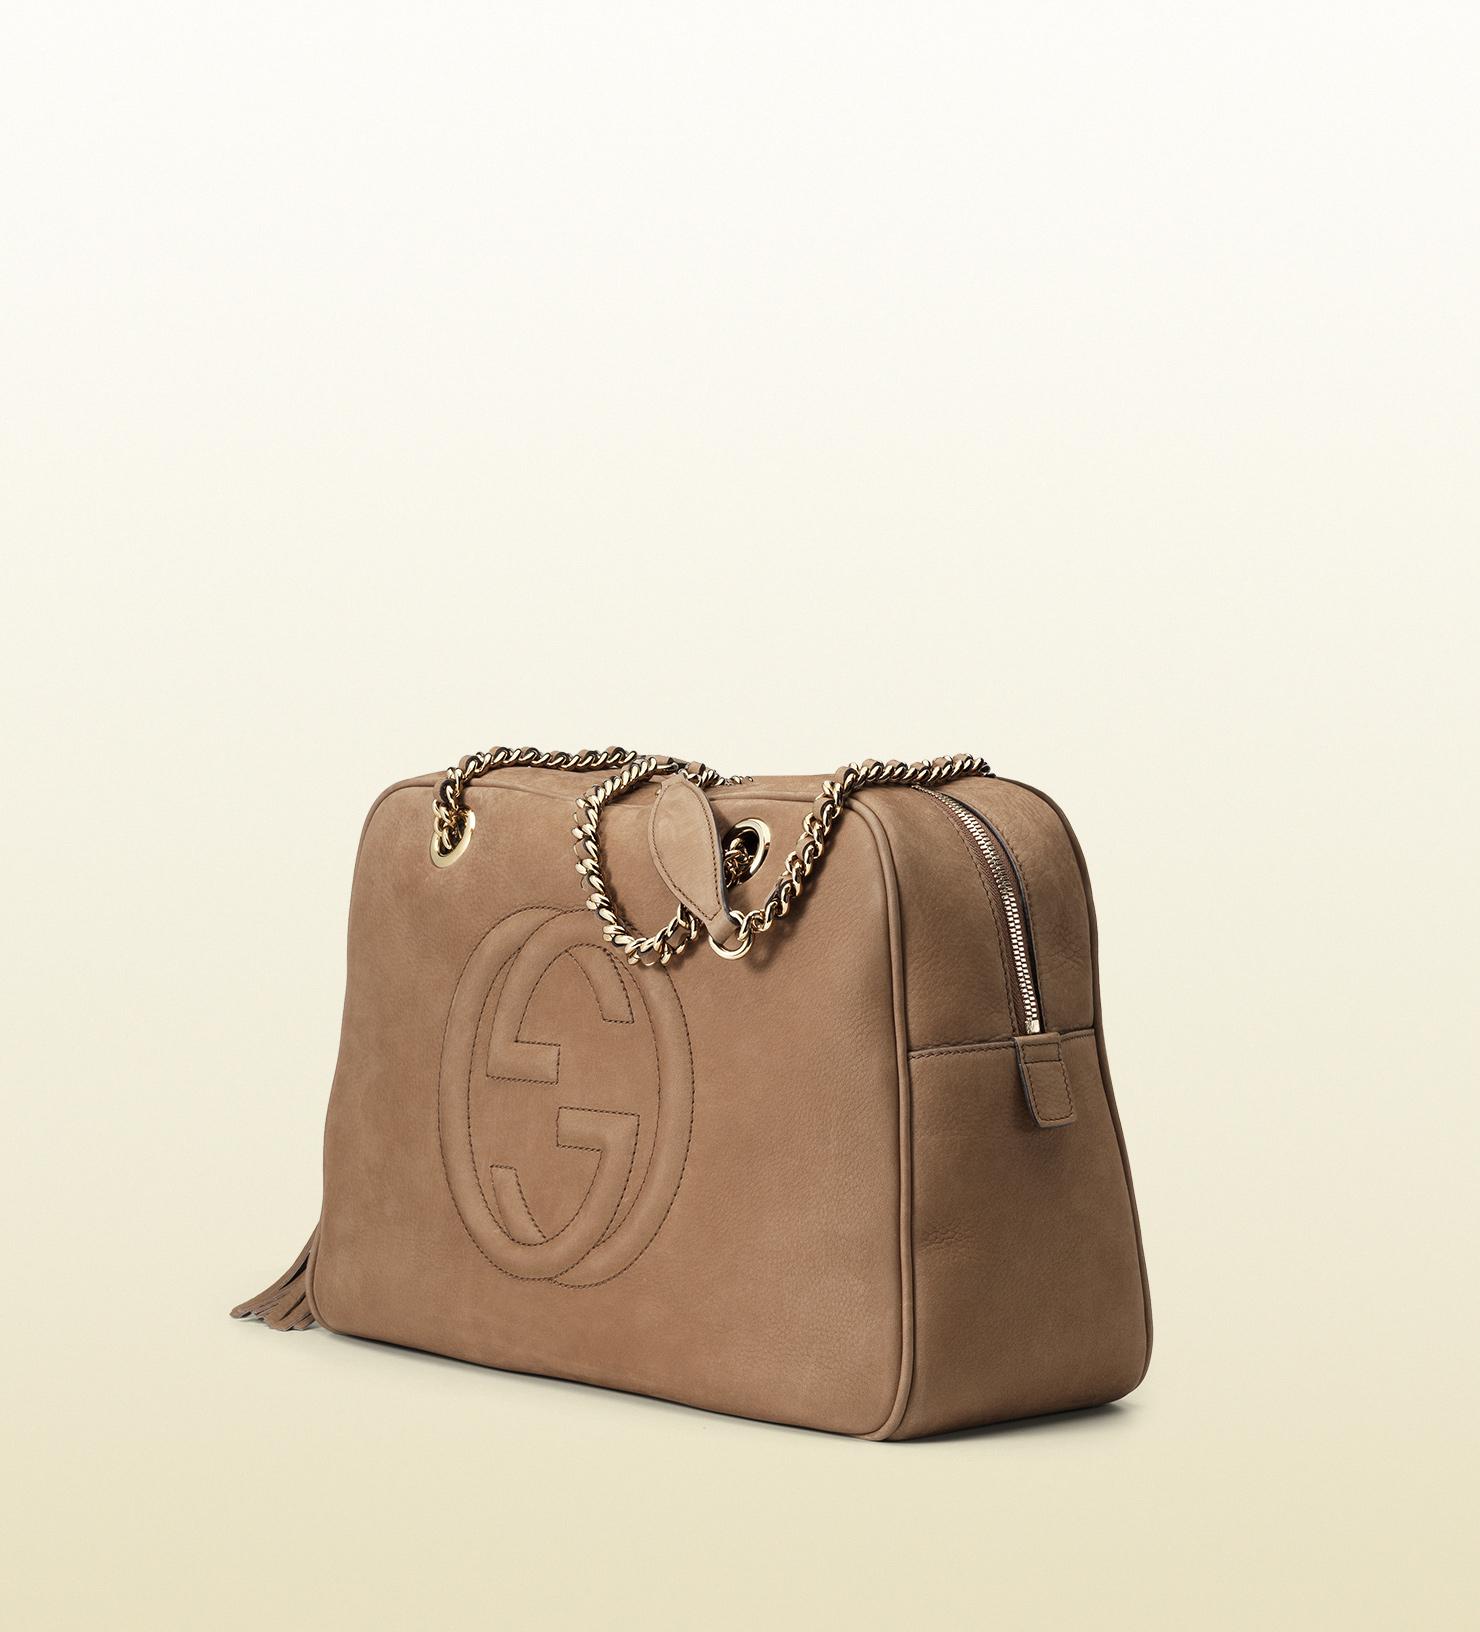 5cdd9c07b978 Gucci Soho Nubuck Leather Chain Shoulder Bag in Brown - Lyst